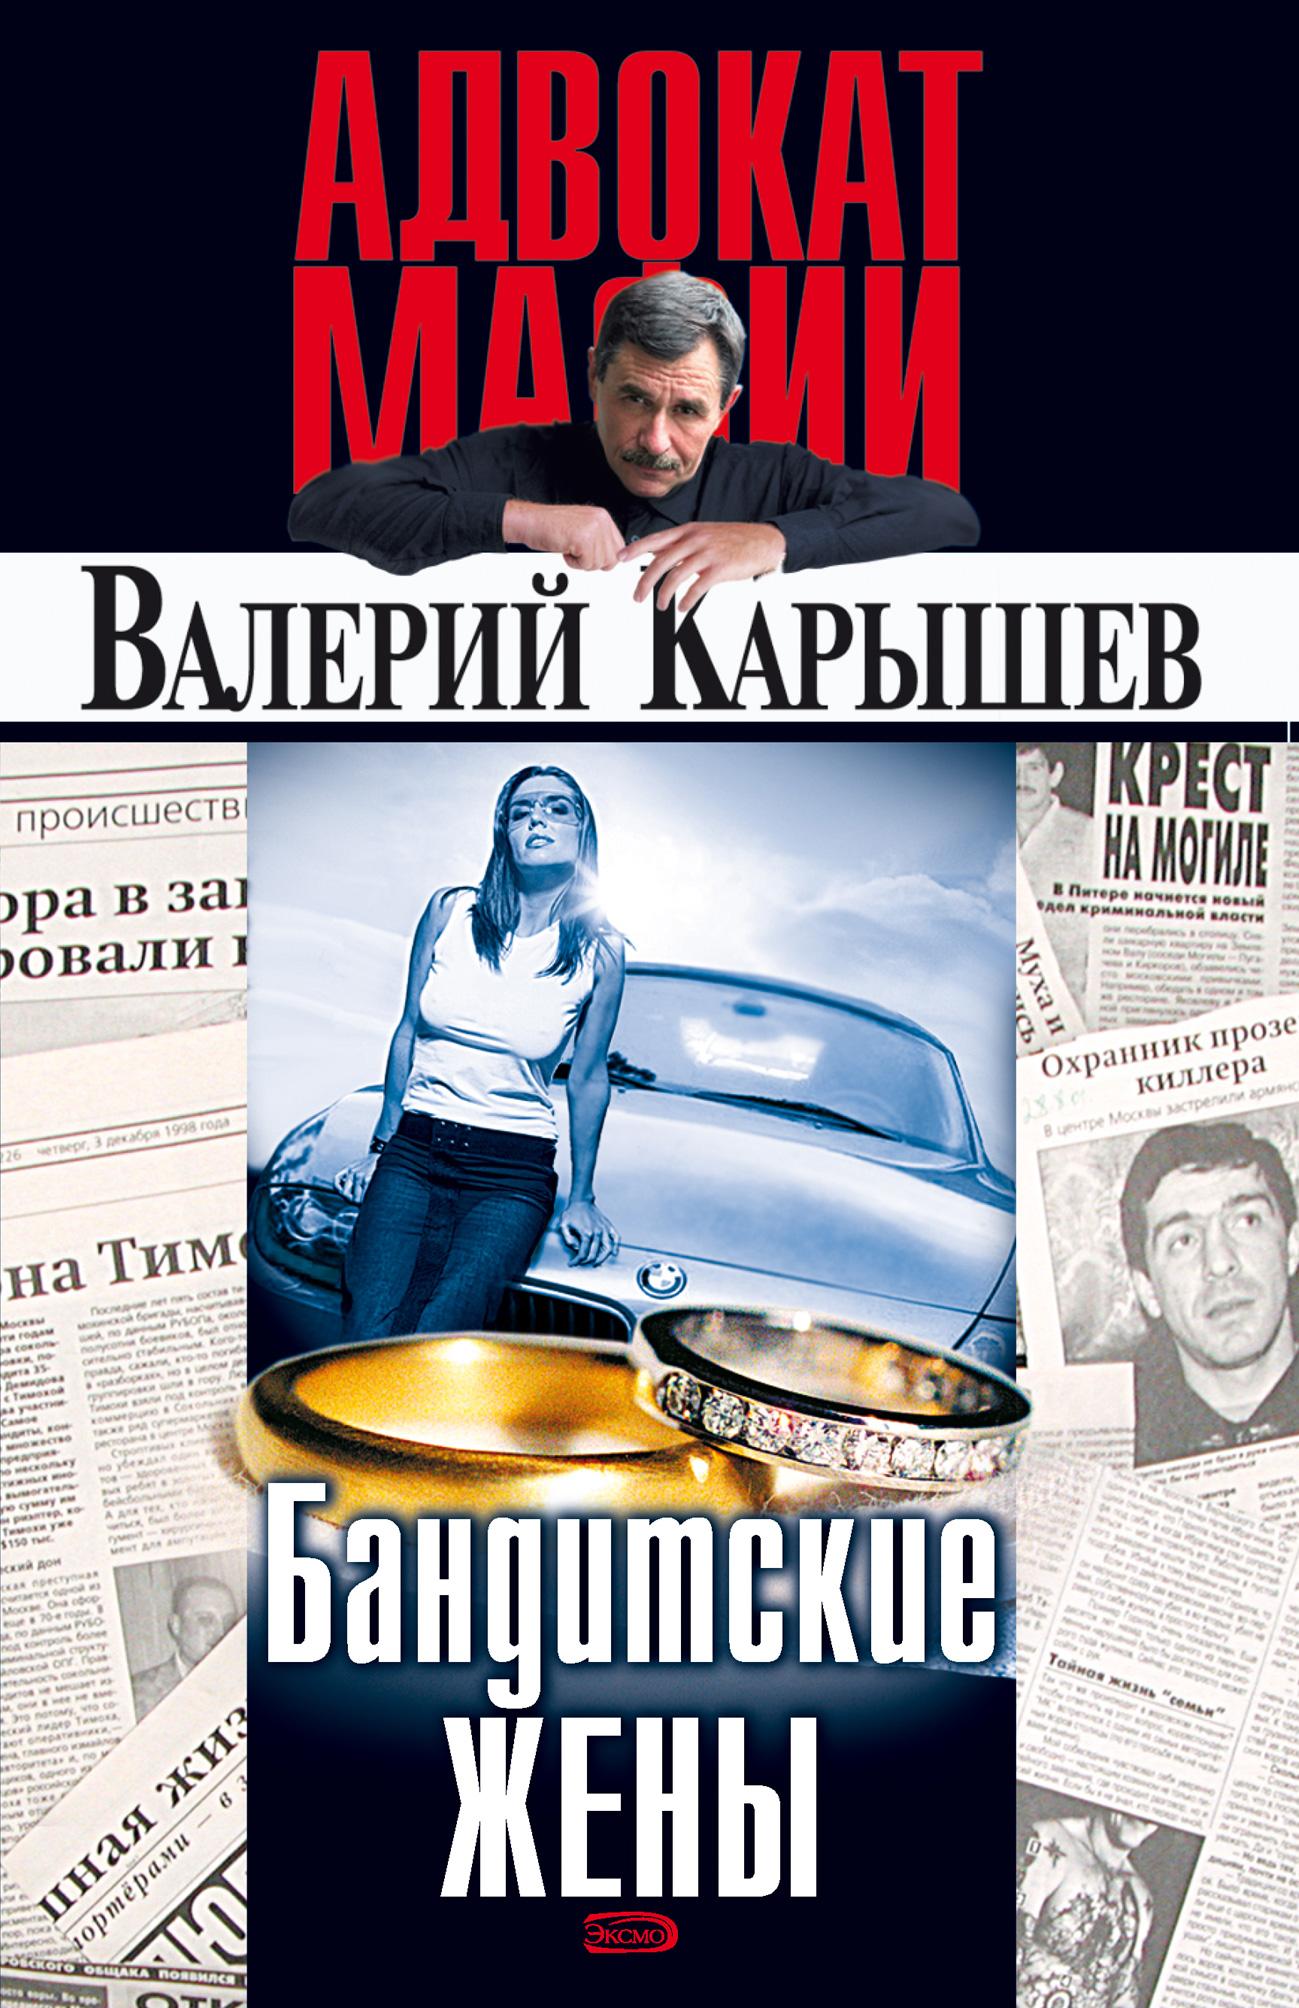 Валерий Карышев Бандитские жены валерий карышев бандитские жены